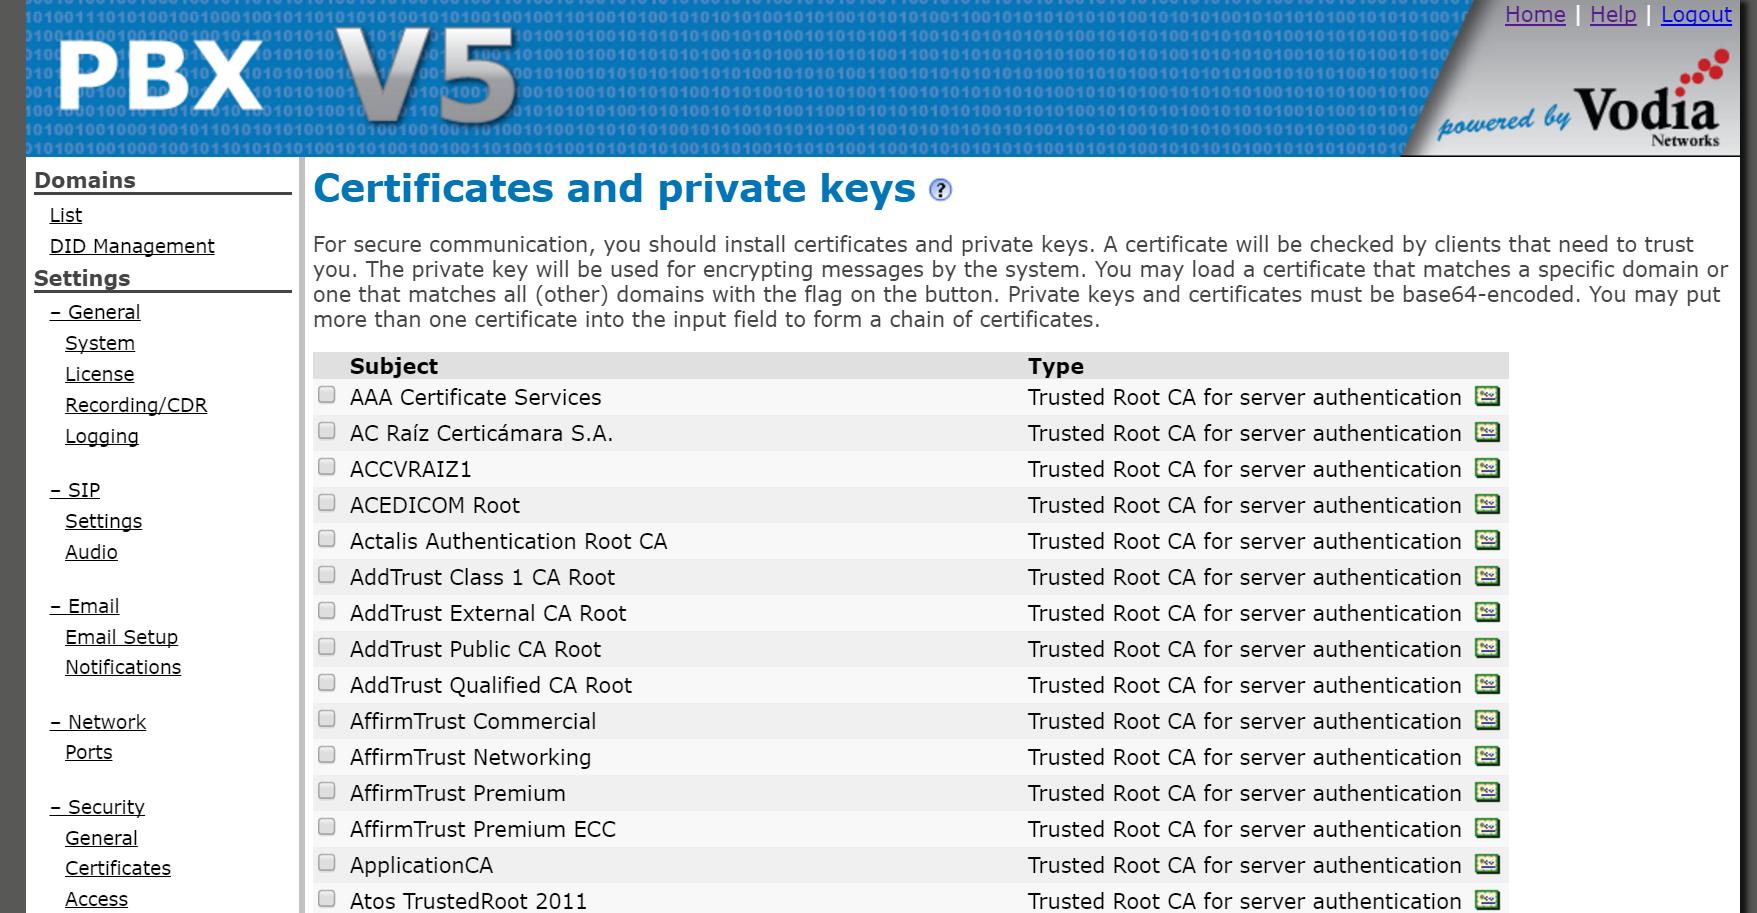 Vodia PBX Software - Certificate list